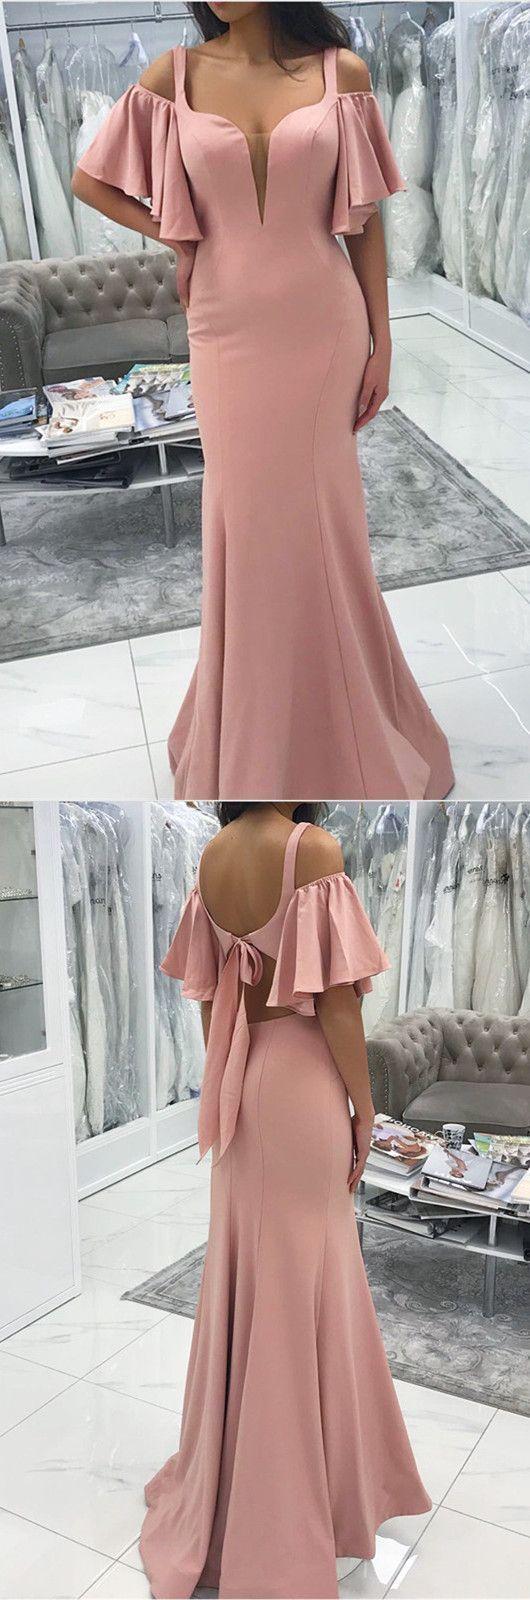 Sexy Cold Shoulders Design Long Floor Length Mermaid Prom Dresses